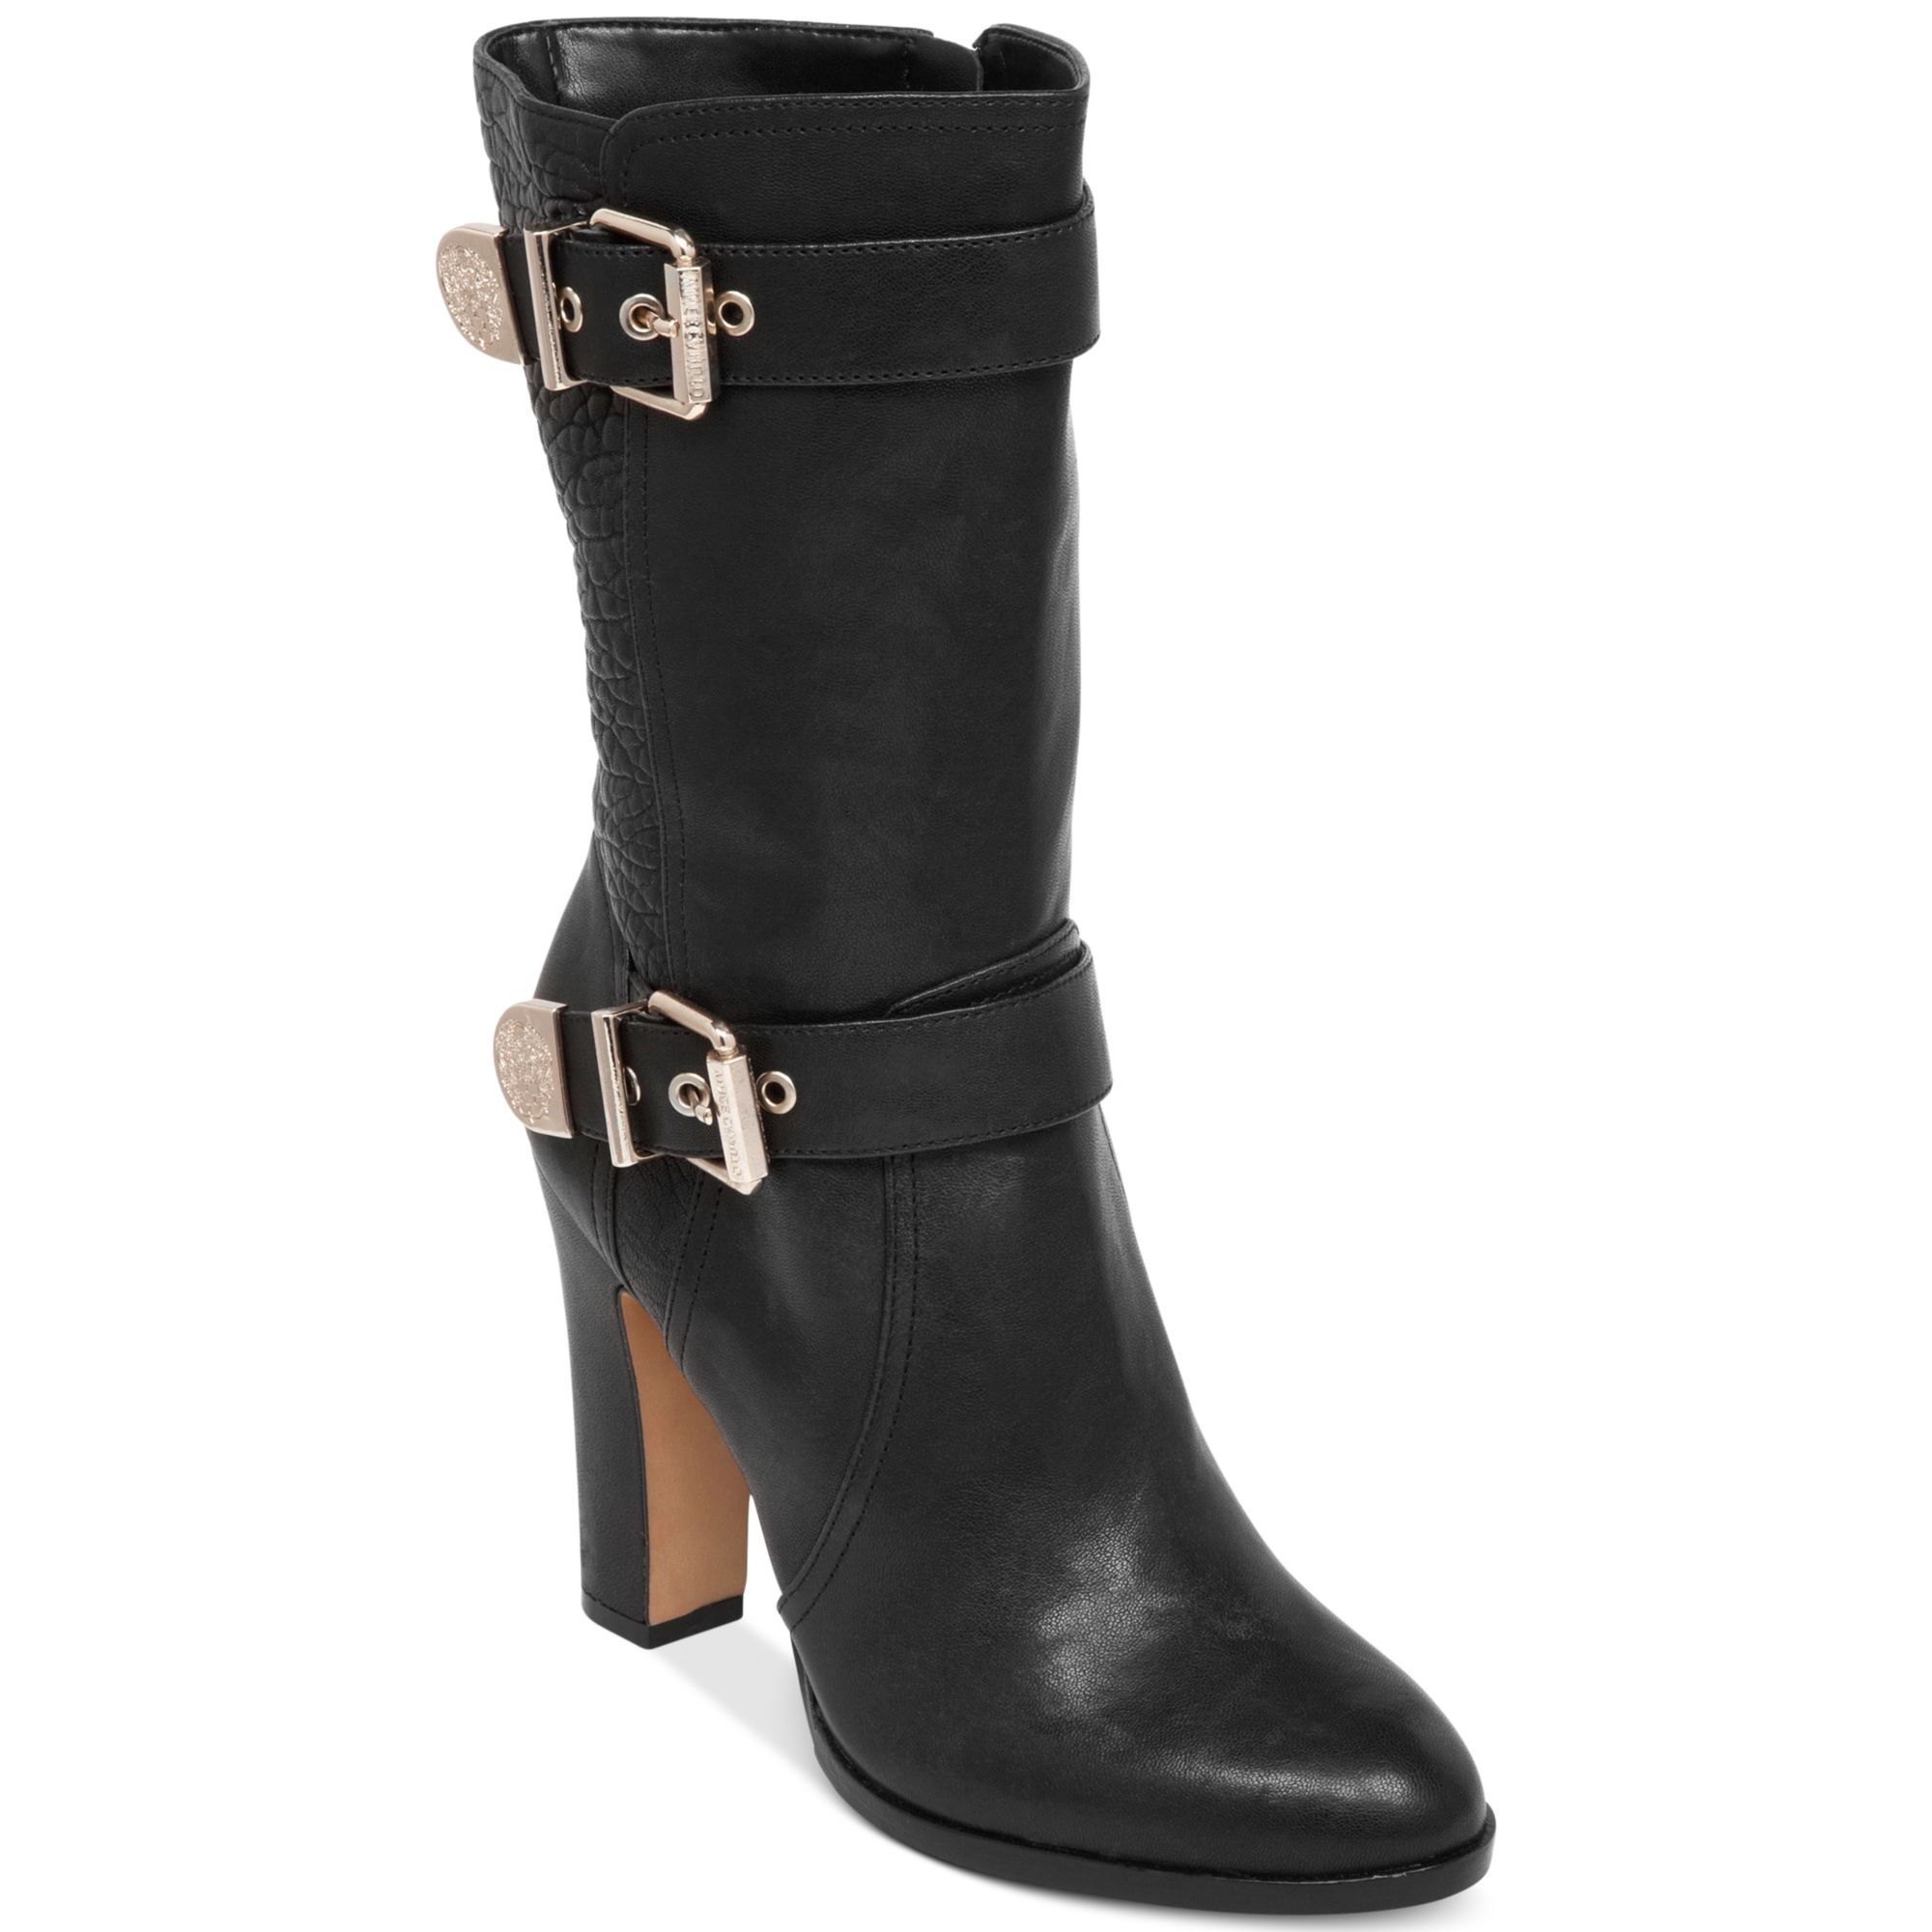 Vince Camuto Callison High Heel Boots In Black Black Gold